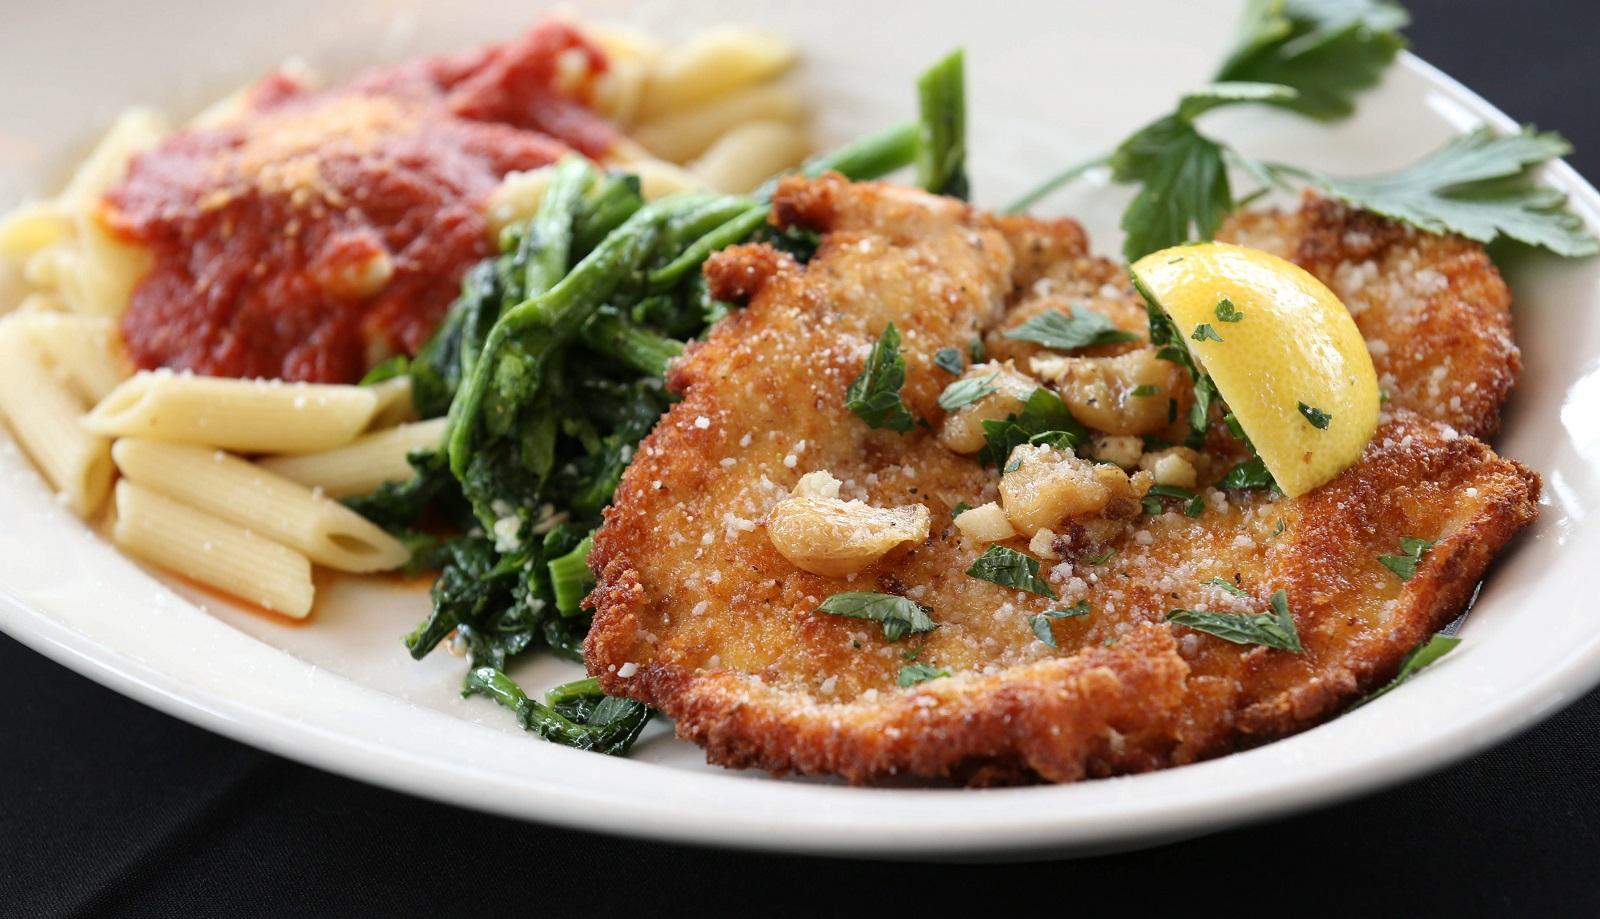 Chicken with lemon, garlic and caper garnish accompanied by rapini greens and pasta. (Sharon Cantillon/Buffalo News)